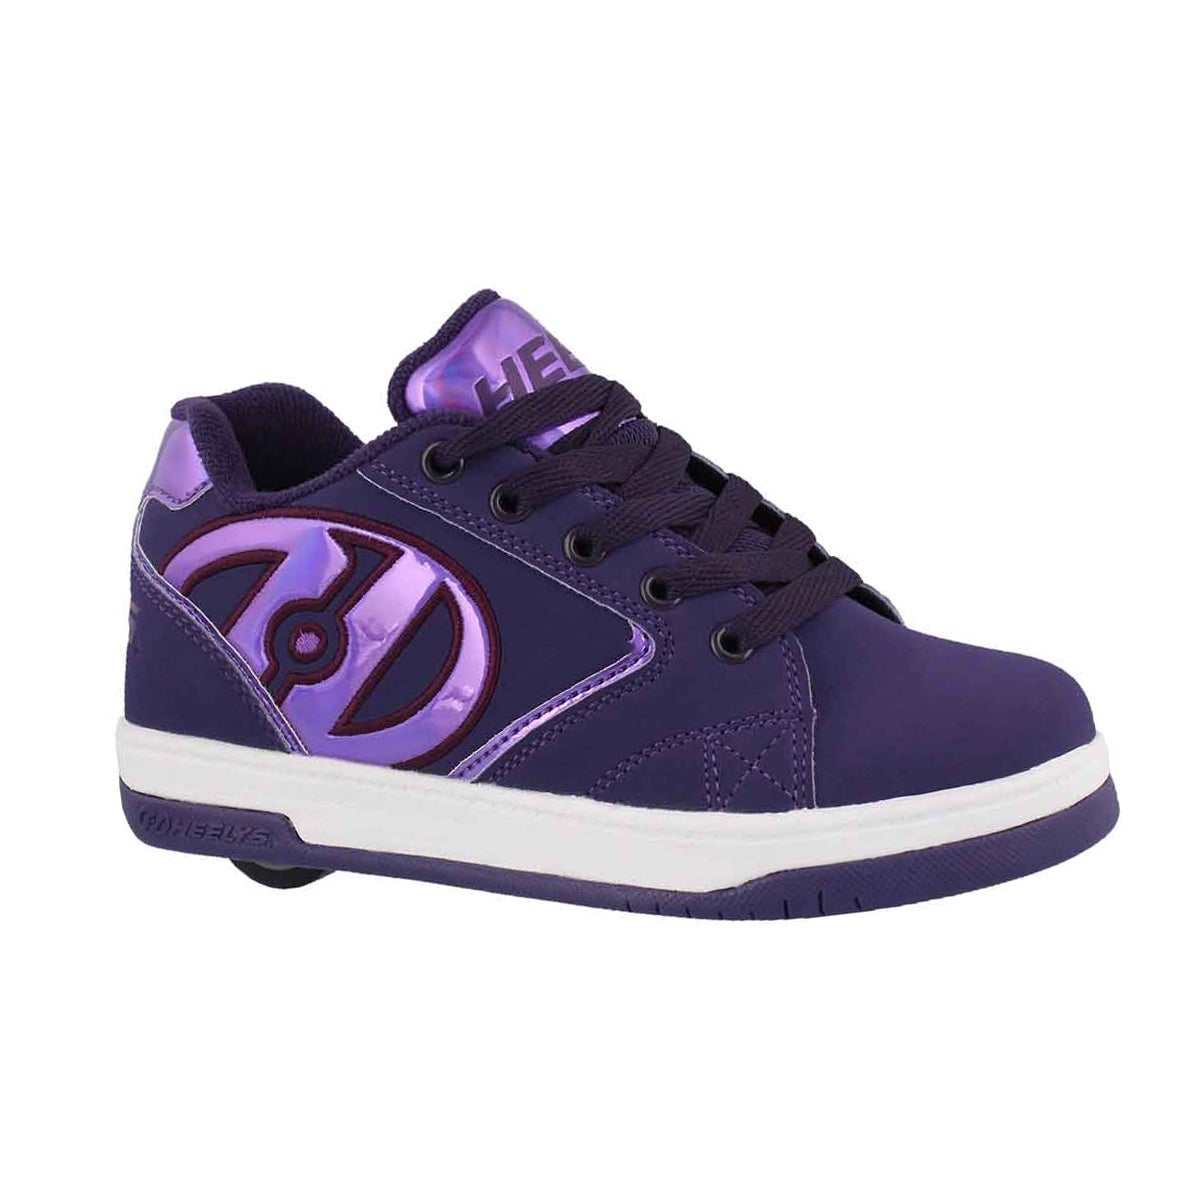 Softmoc Nike Shoes